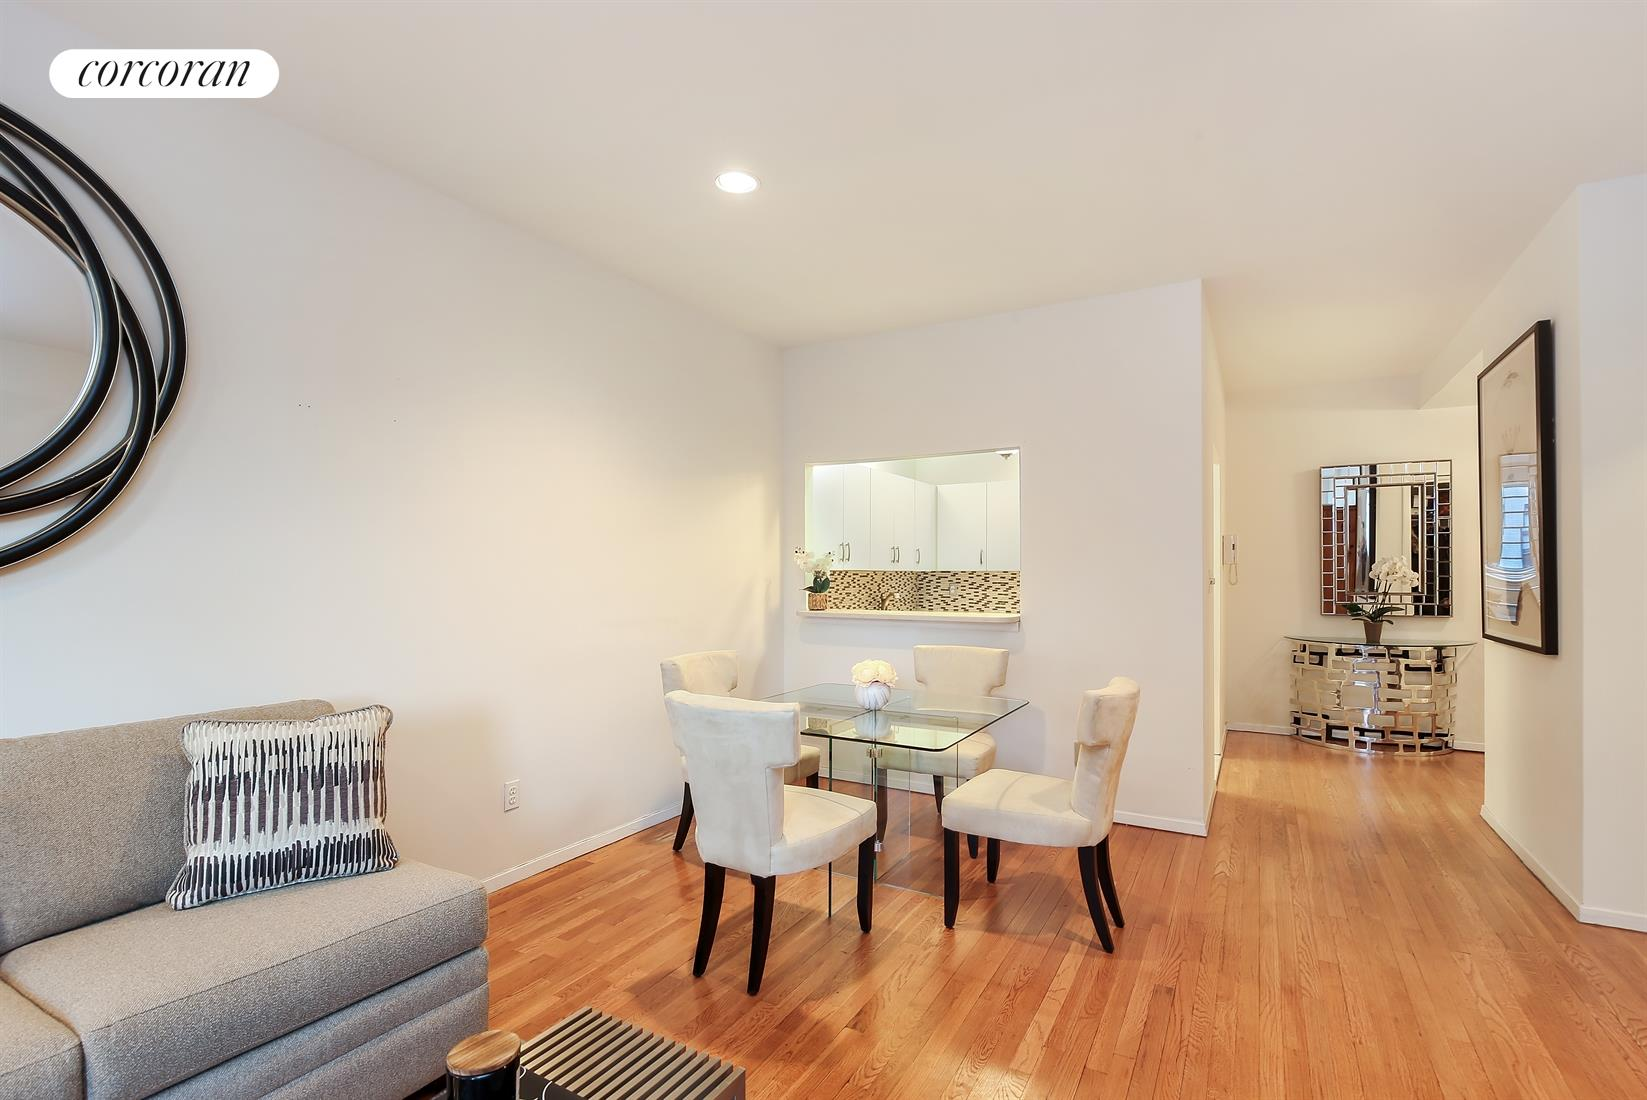 Corcoran, 204 WEST HOUSTON ST, Apt. 5B, West Village Real Estate ...